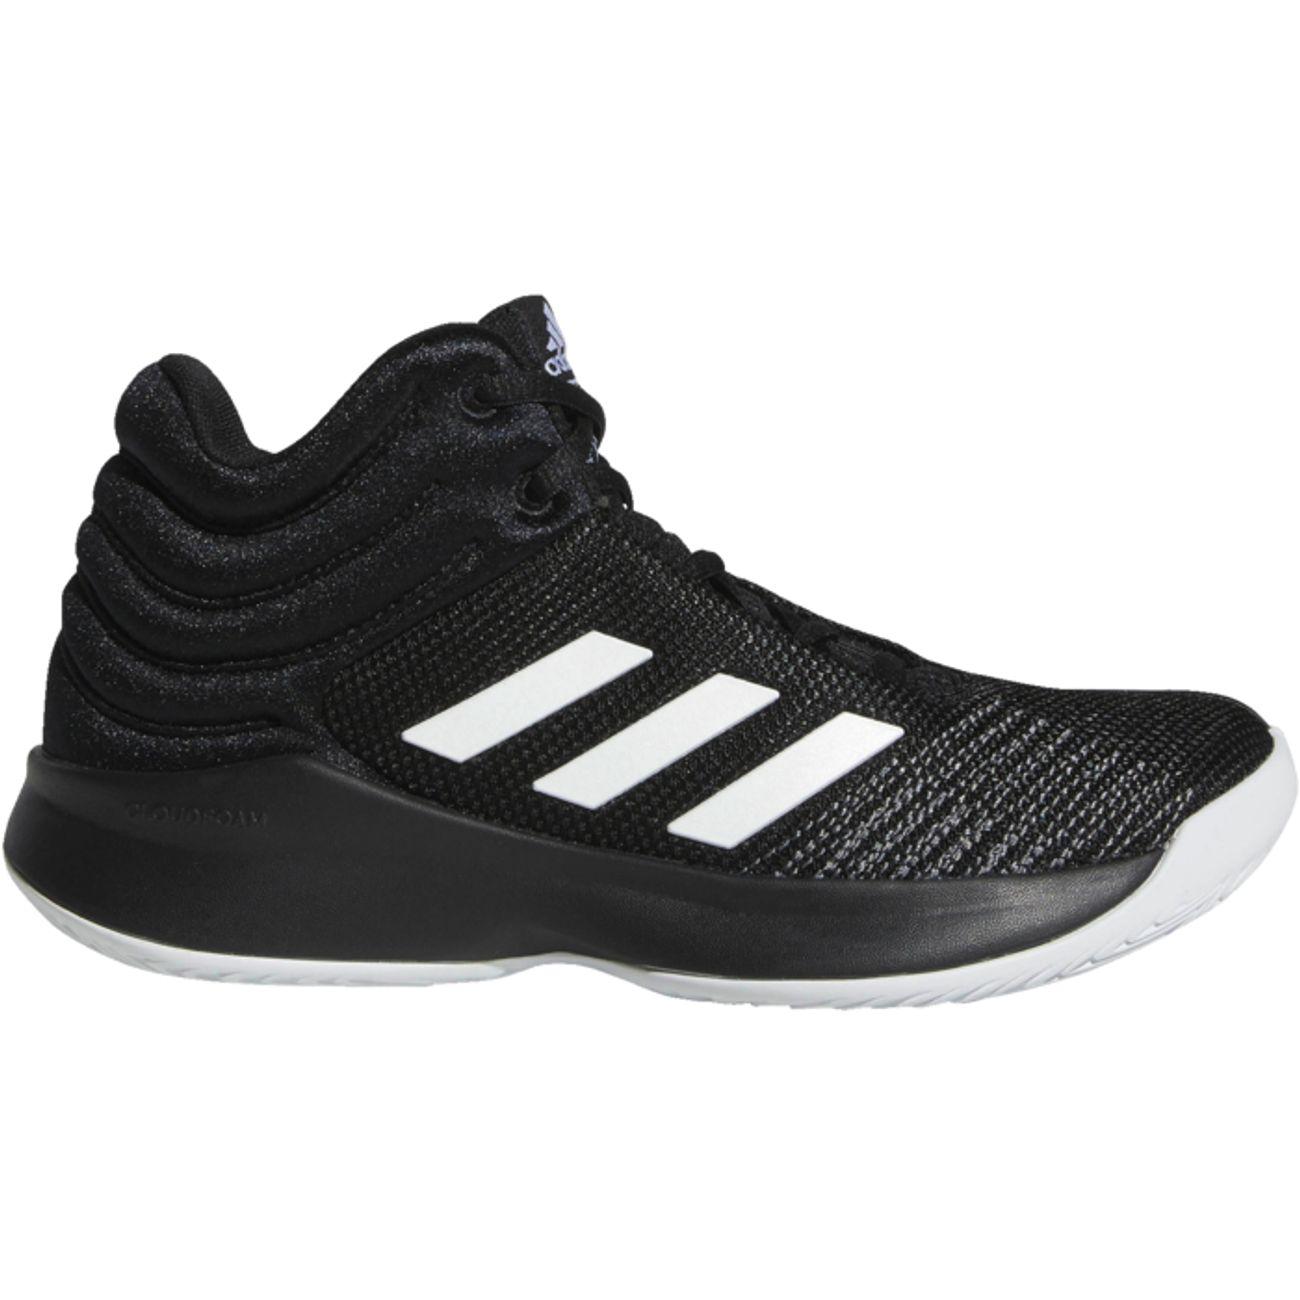 the best attitude f9d83 165bc adidas Chaussures de basketball enfant PRO SPARK K 2018 adidas YGRcPytzn